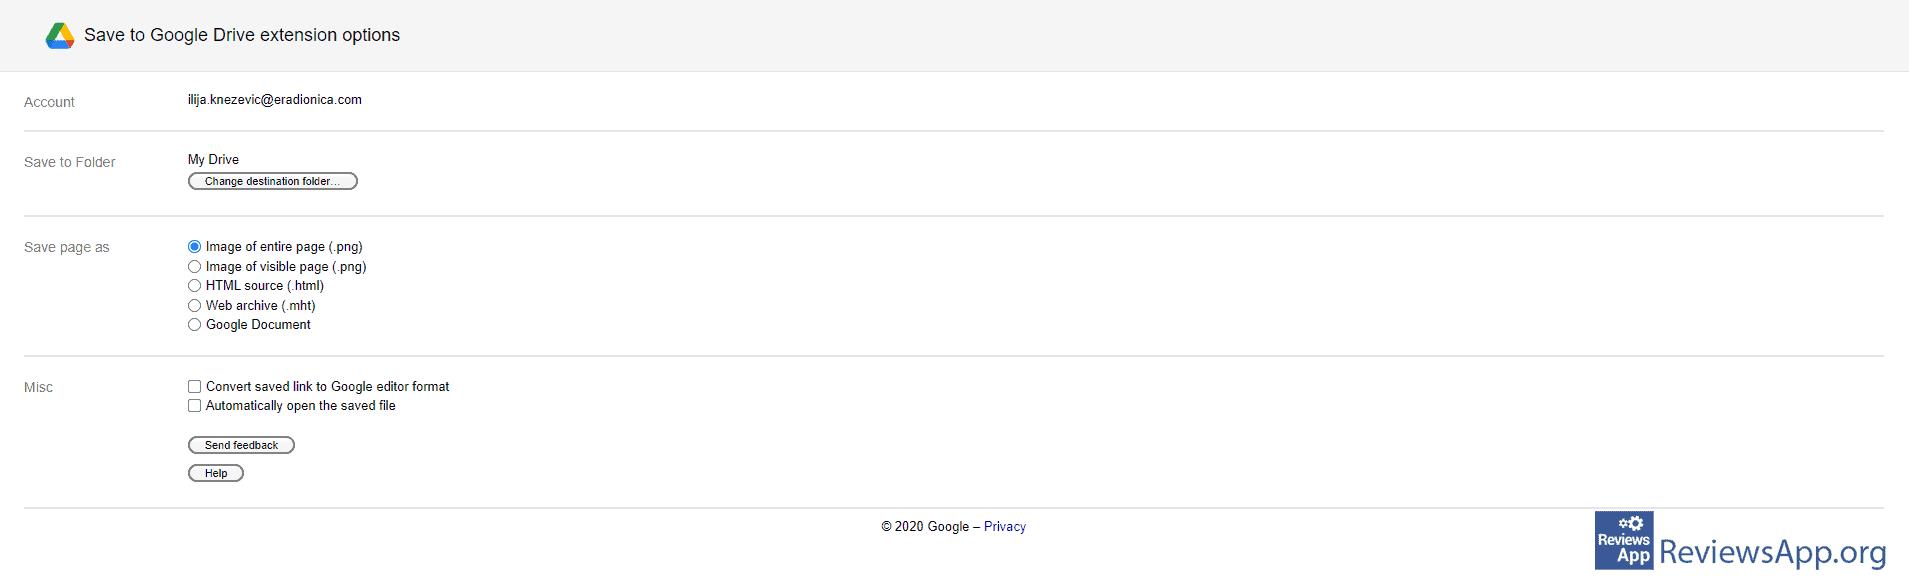 Save to Google Drive settings